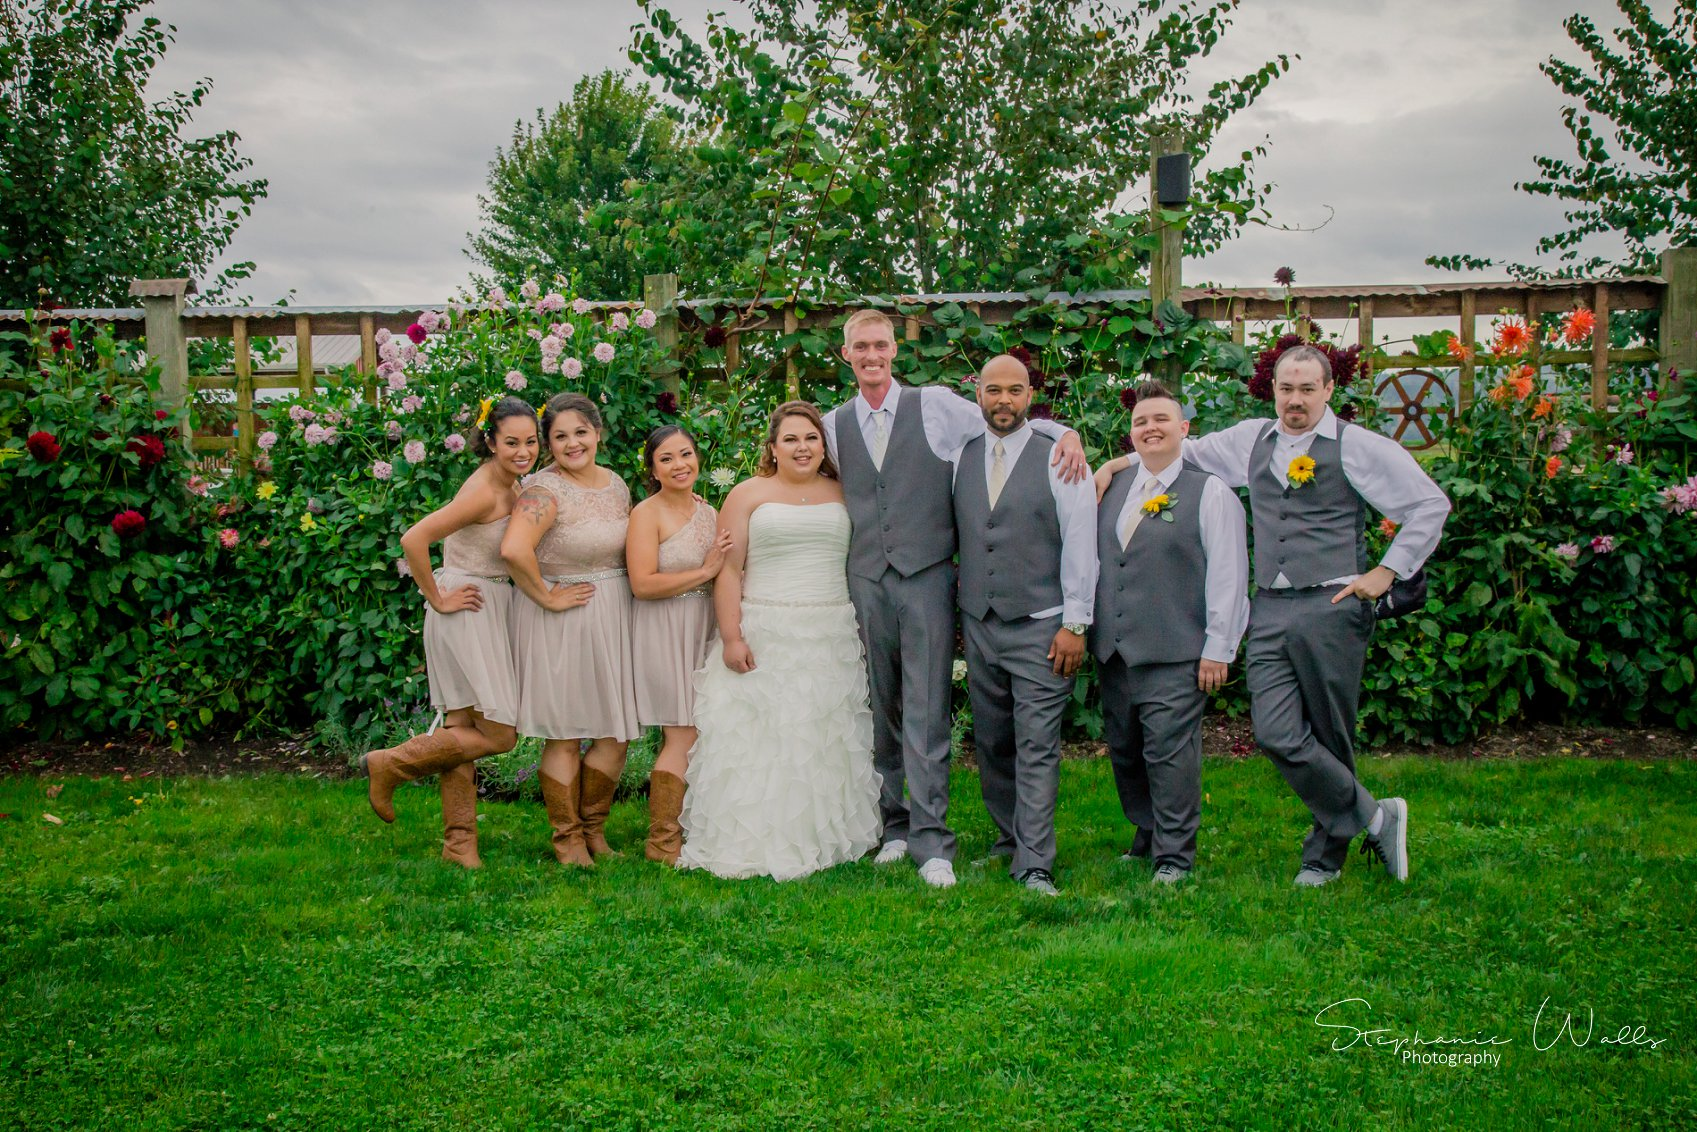 Kimble Wedding 102 Marlena & Allans | Snohomish Red Barn Events (Stocker Farms) | Snohomish, Wa Wedding Photographer